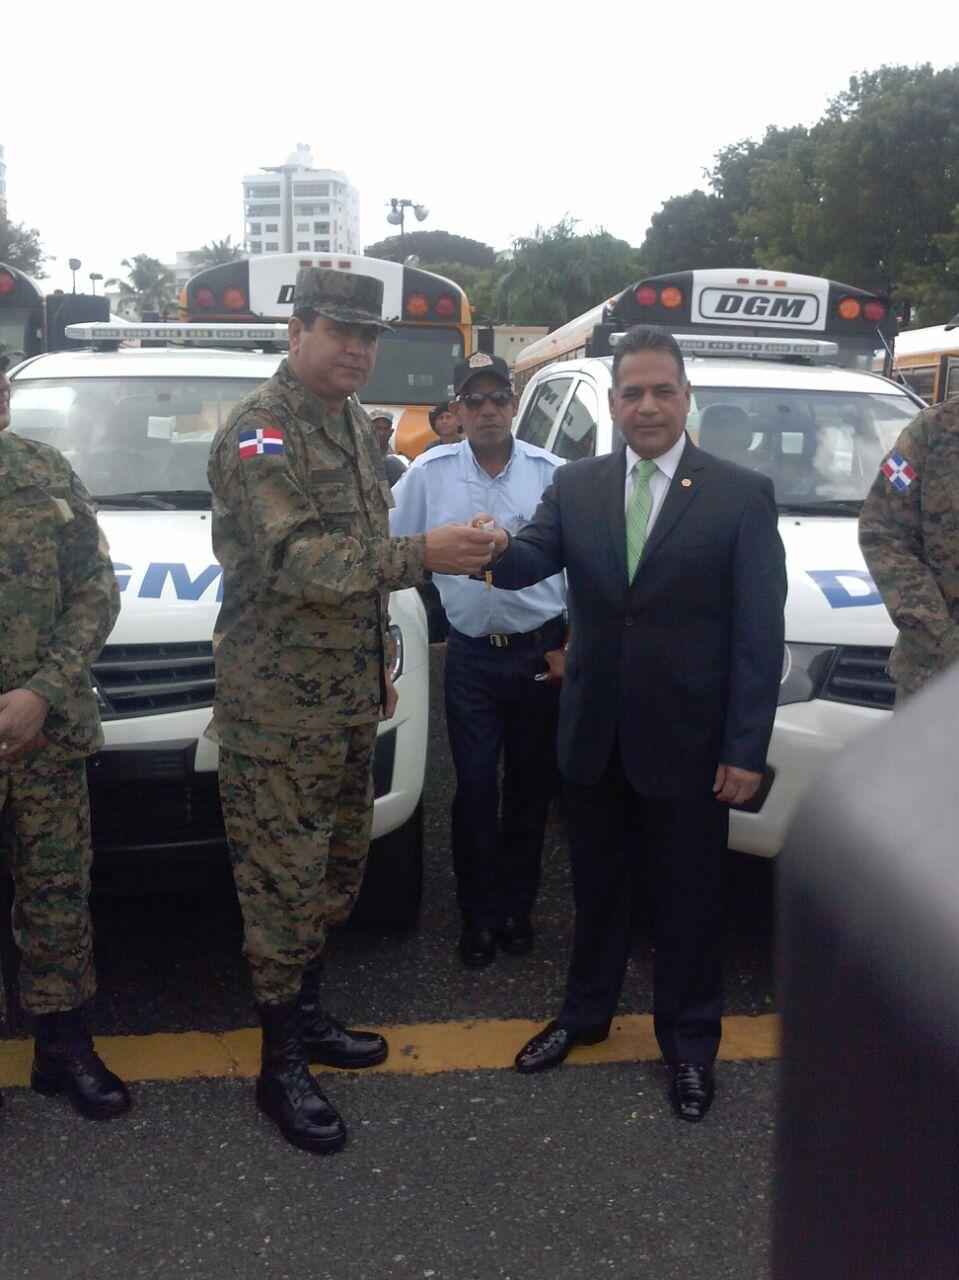 Ministerio de defensa entrega equipos a migraci n 16 minutos for Ministerio de migracion